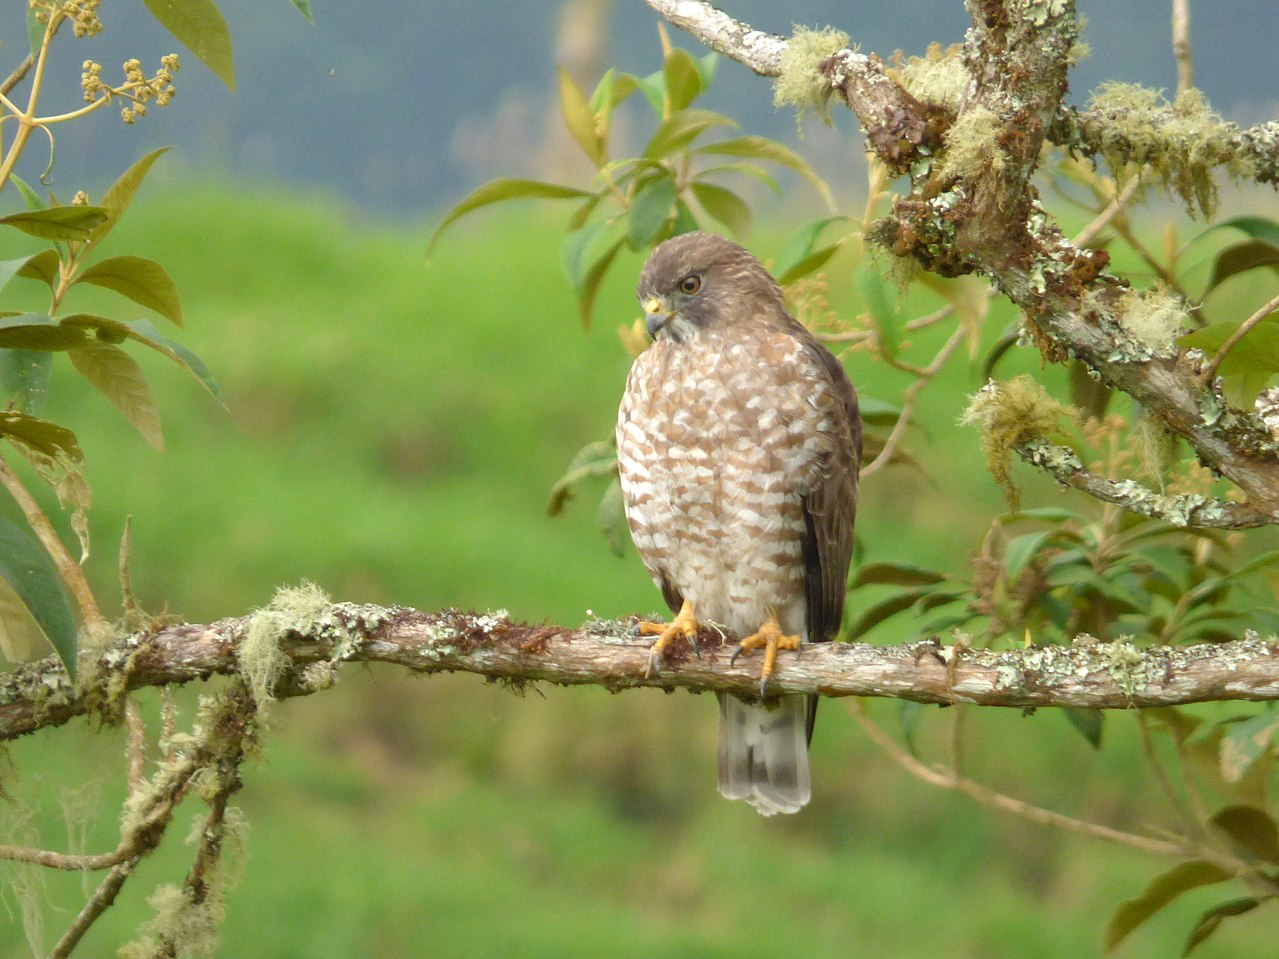 Broad-winged hawks (Buteo platypterus) are pretty common around here. Photo credit: Alejandro Bayer Tamayo via Wikipedia Commons .